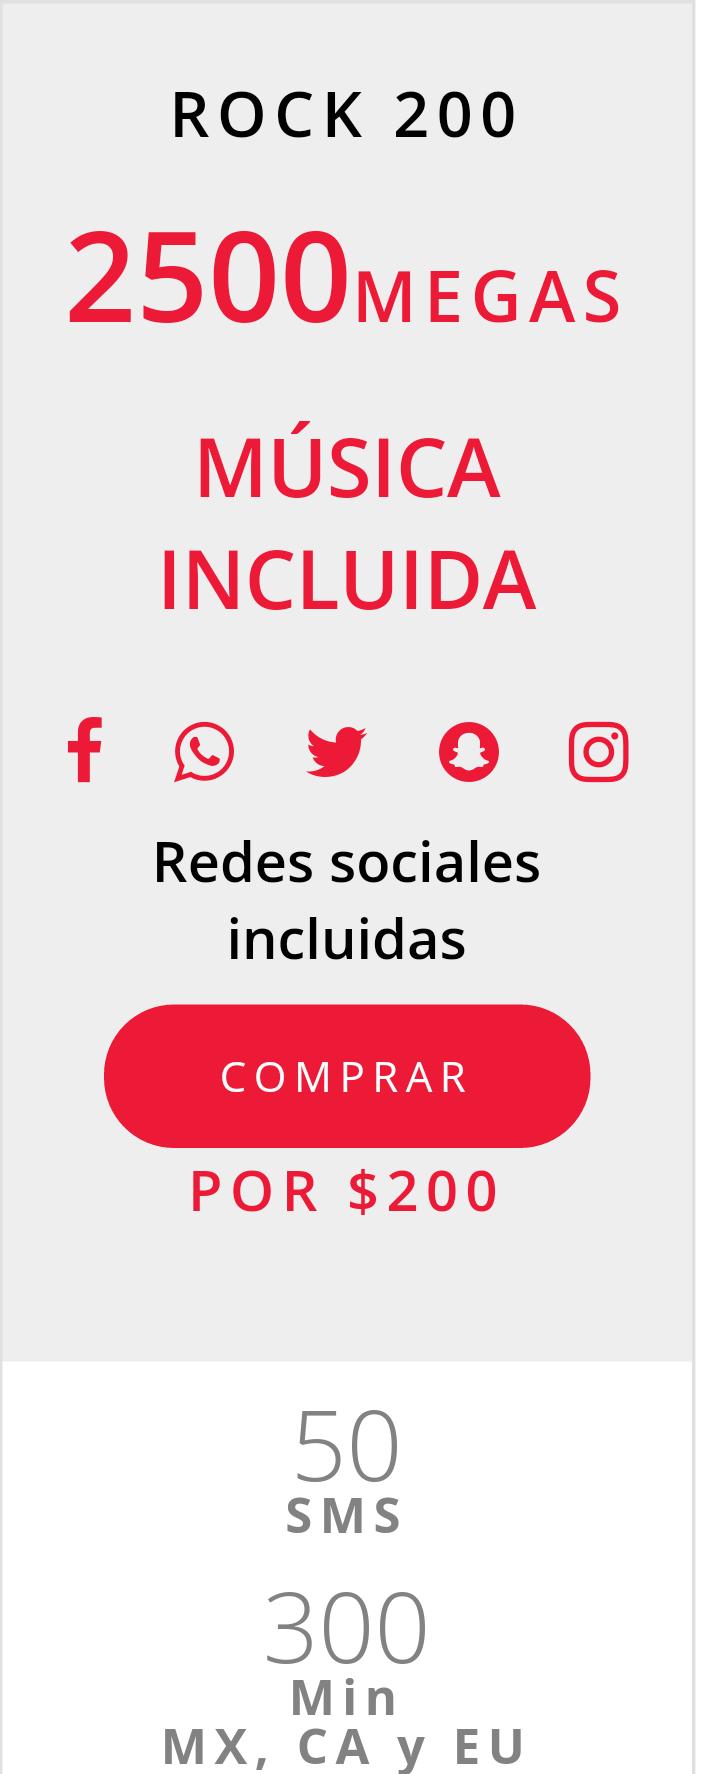 Virgin Mobile: $200 pesos por 2.5 GB + streaming de música ilimitado + Facebook, WhatsApp, Twitter, Snapchat, e Instagram ilimitados